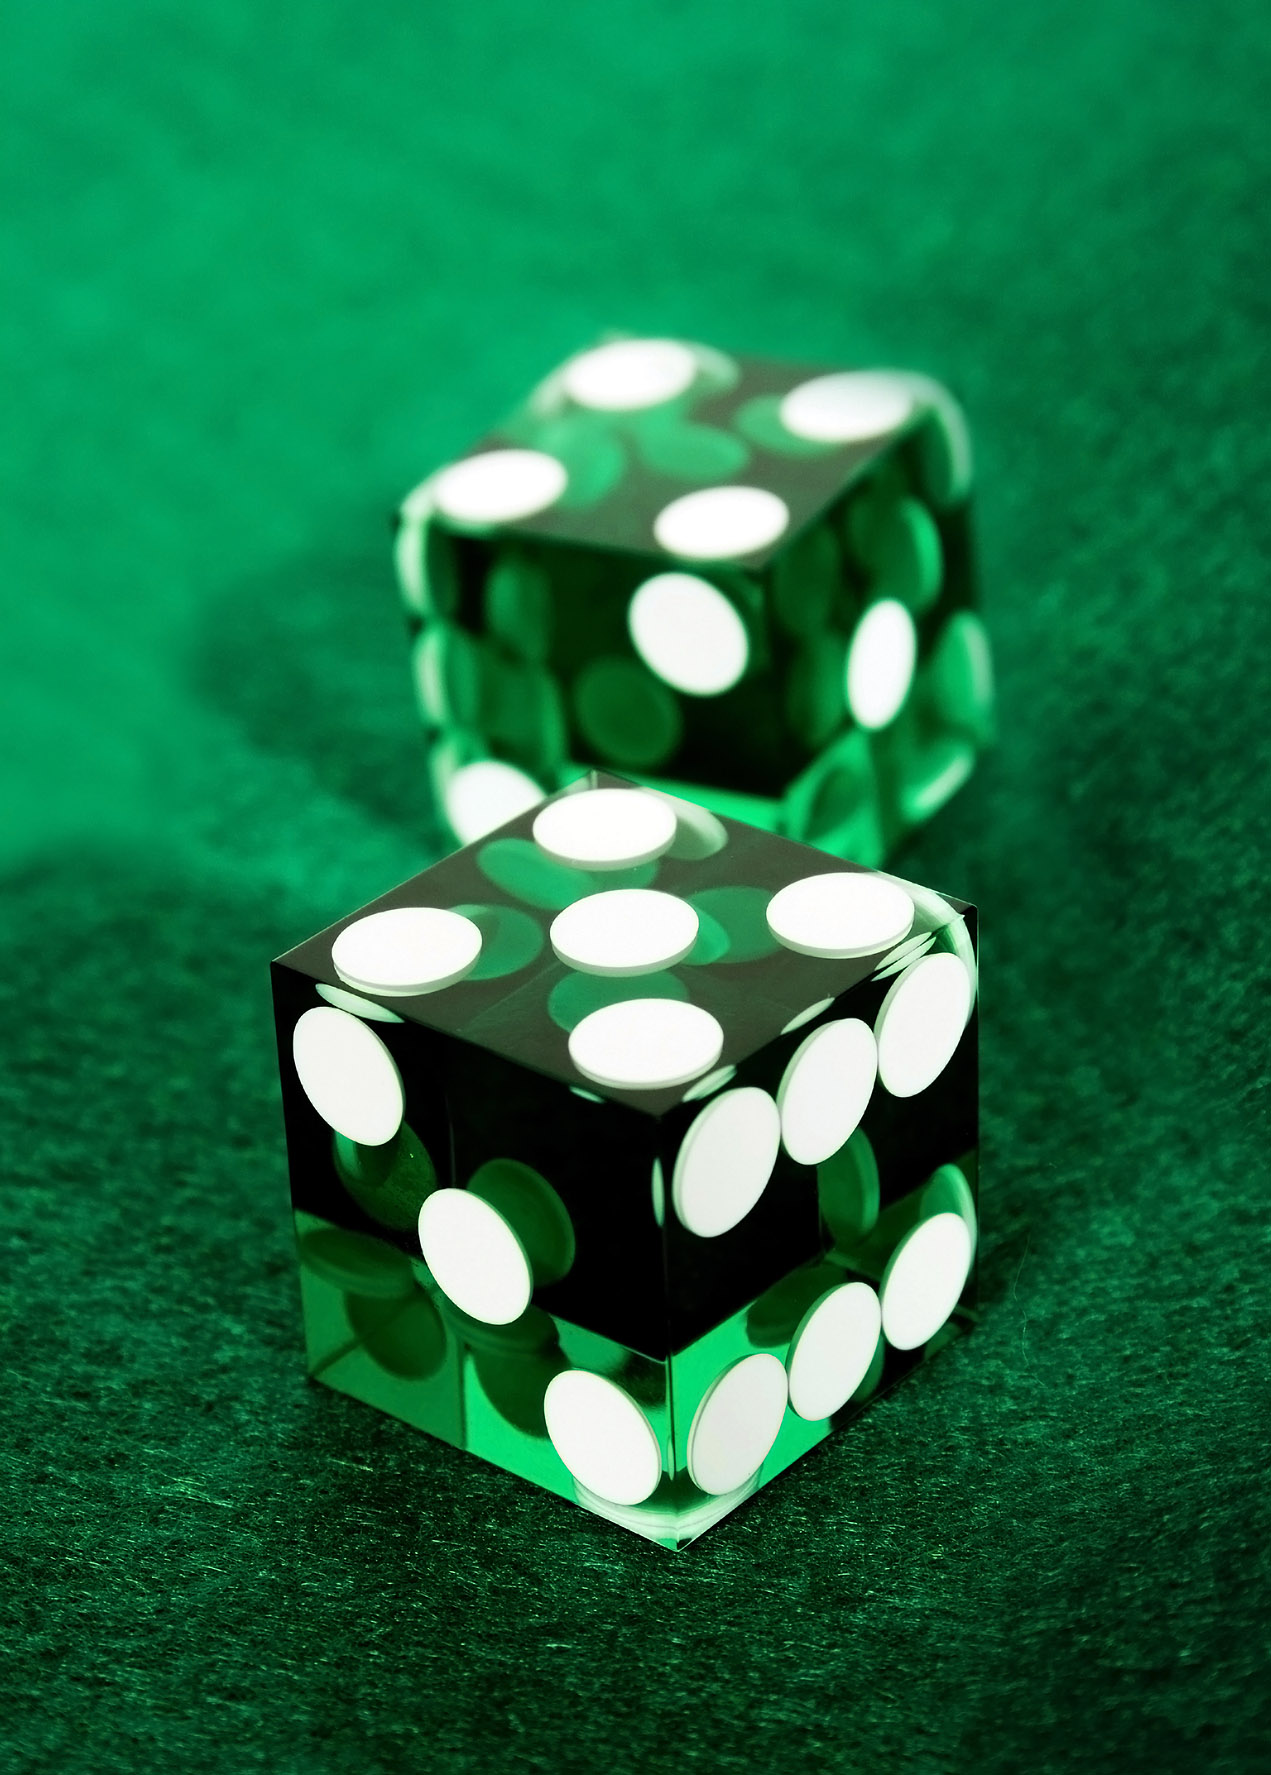 Emerald green casino al green affiliate casino com make make money money program u14a50 unitedpartnerprogram